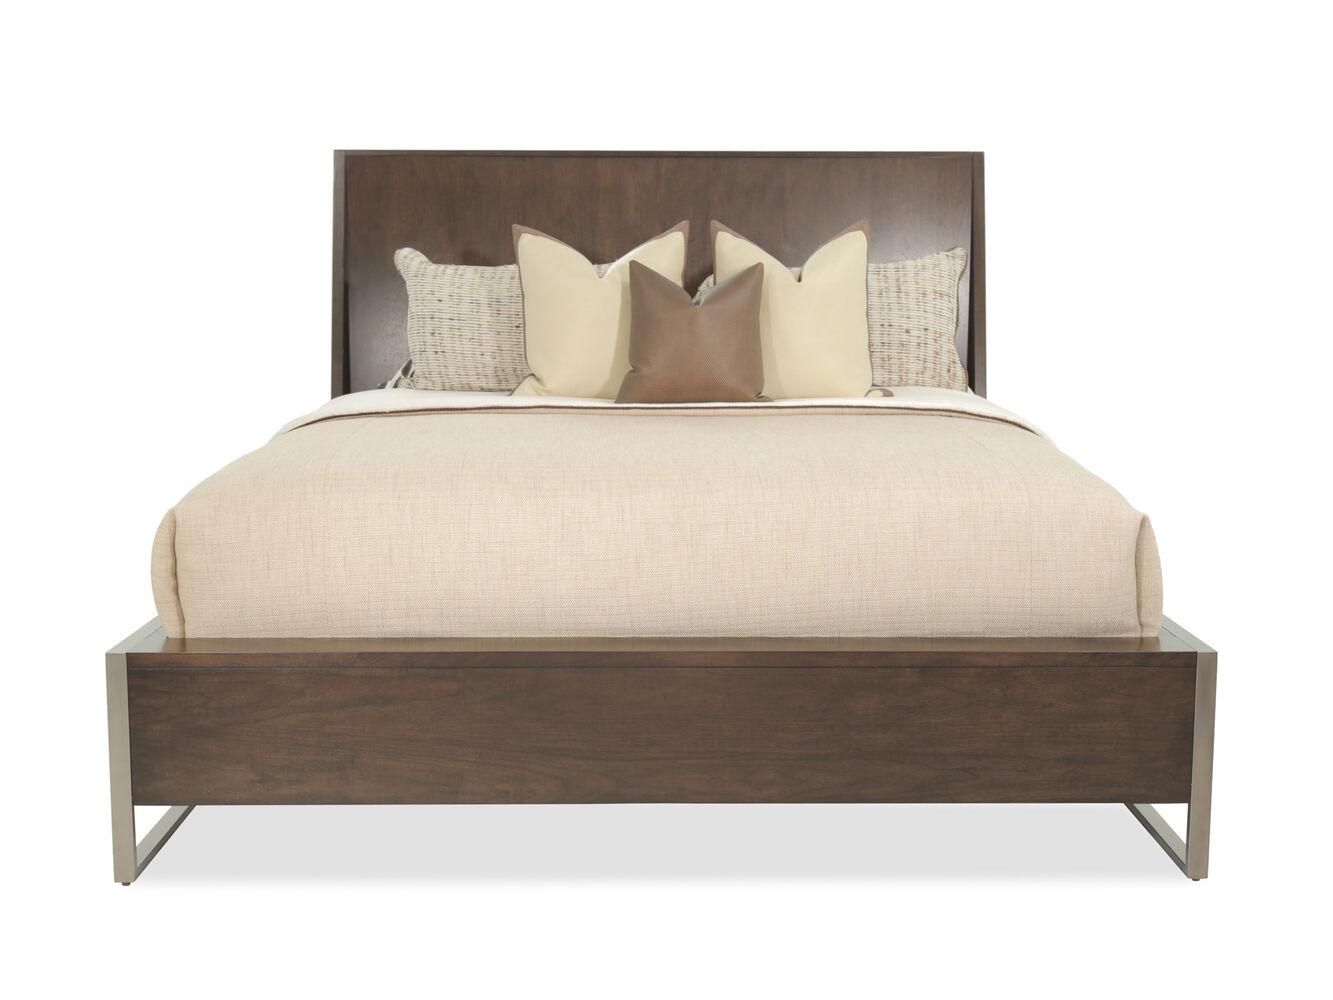 Mathis Brothers Bedroom Furniture Art Furniture Neville Espresso Shelter Bed Mathis Brothers